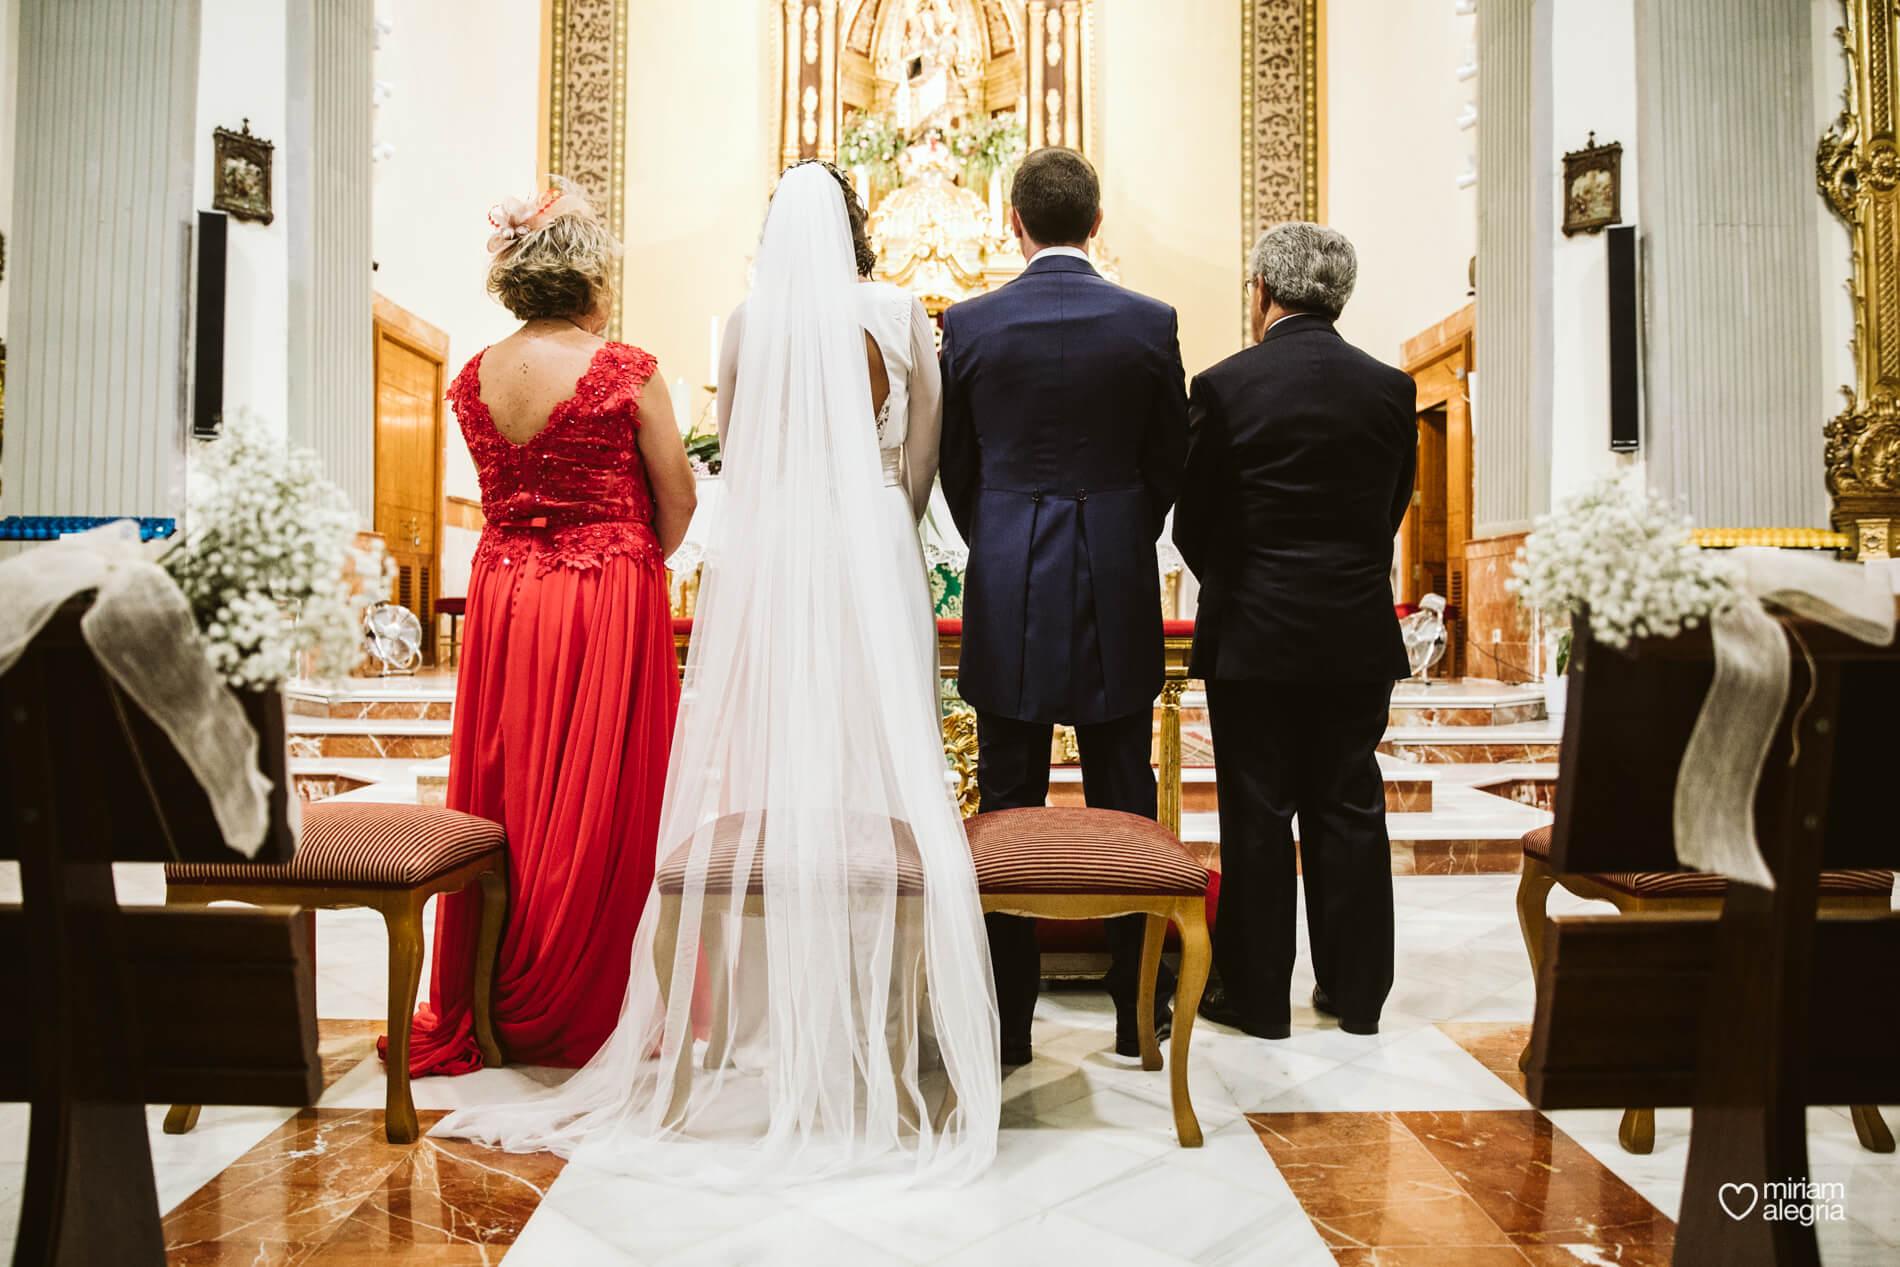 boda-en-iglesia-del-carmen-cartagena-47